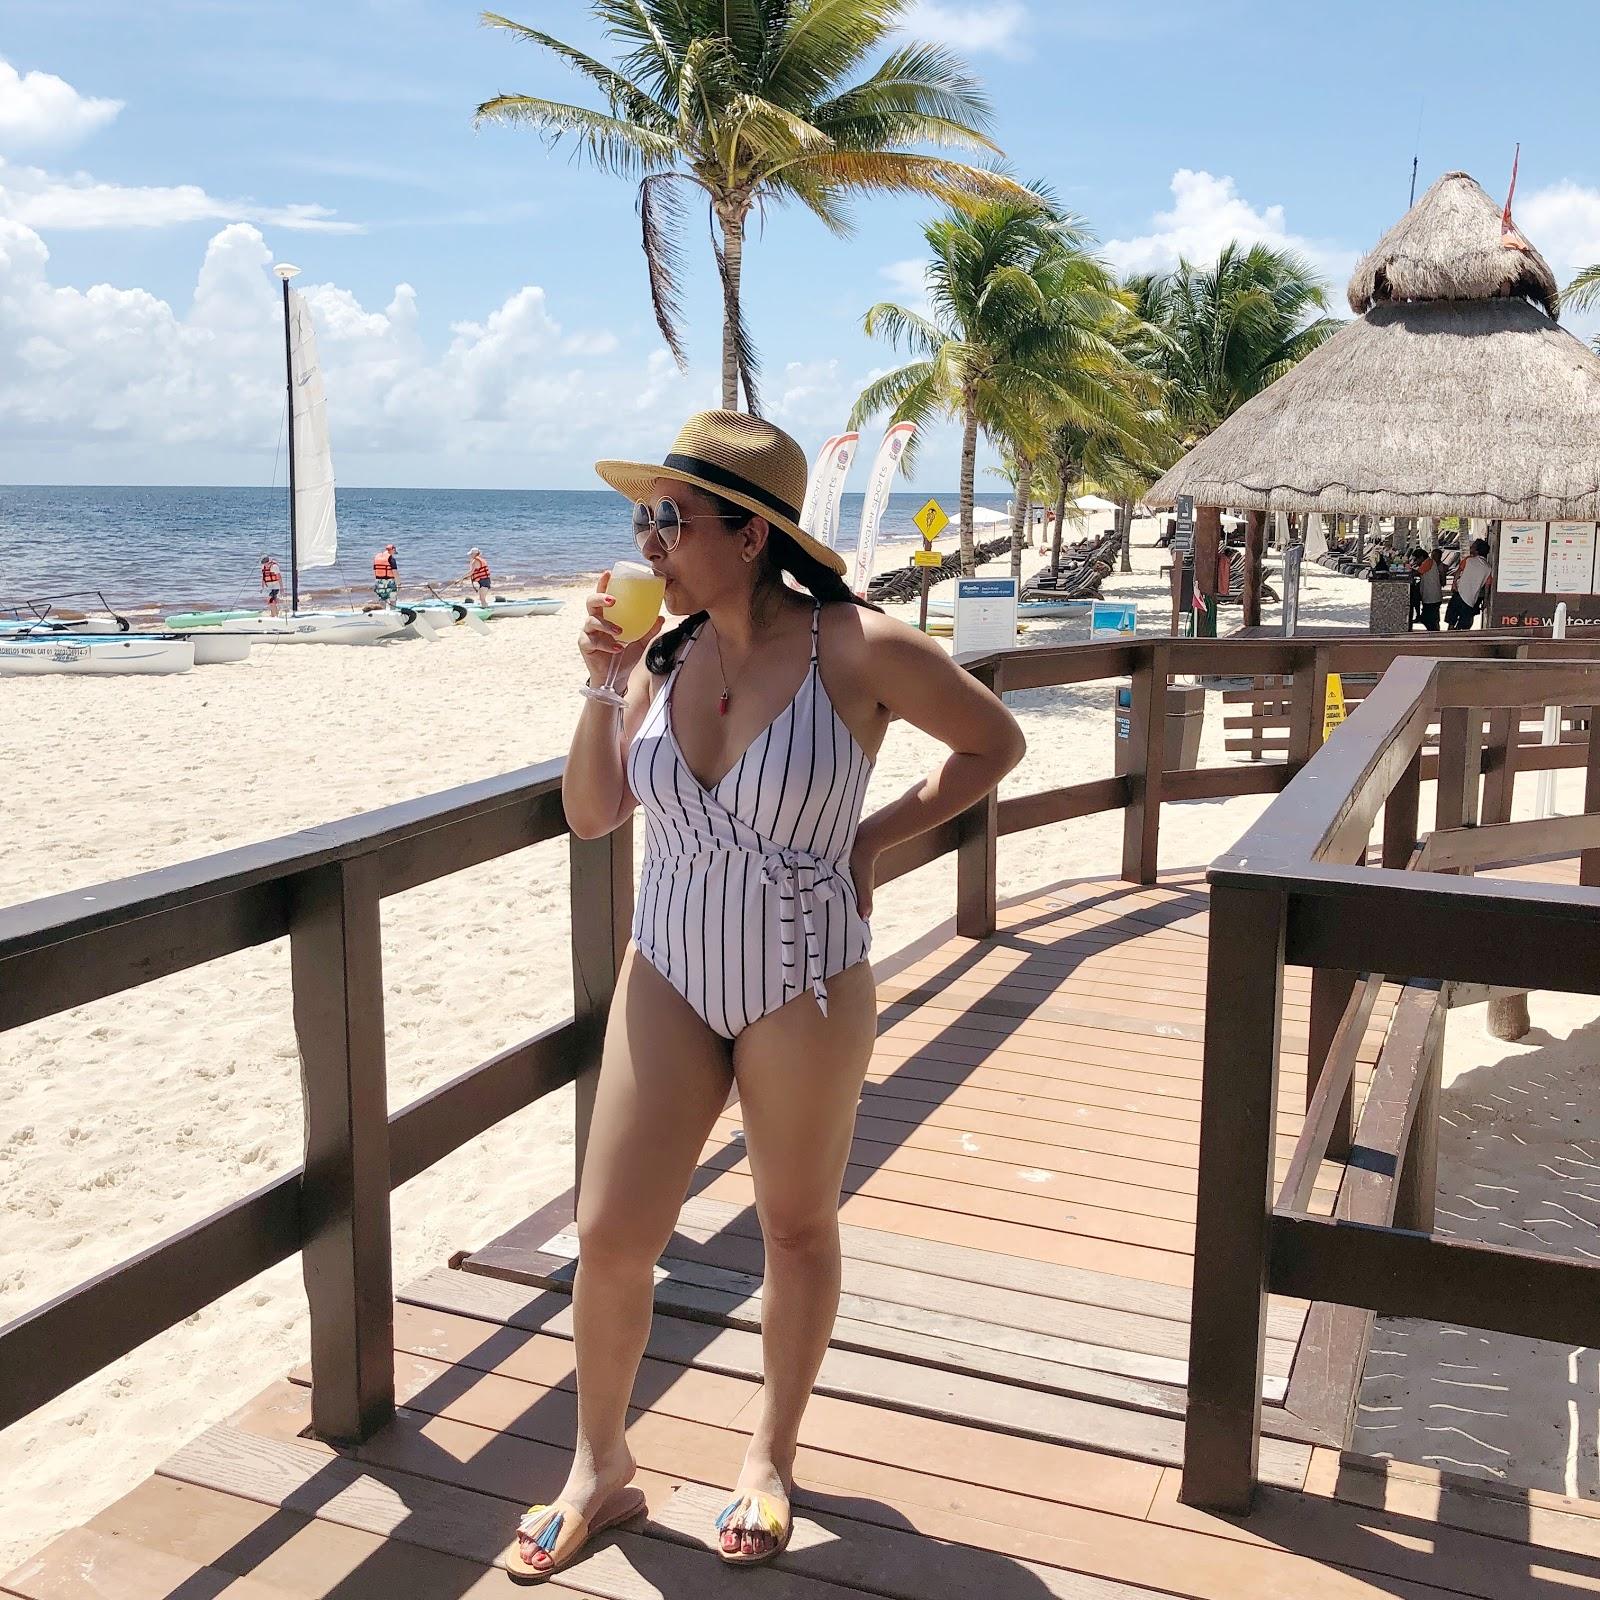 Royalton, Cancun, Riviera Maya, Traveling Trips, Hotel Review, Royalton Riviera Maya Review